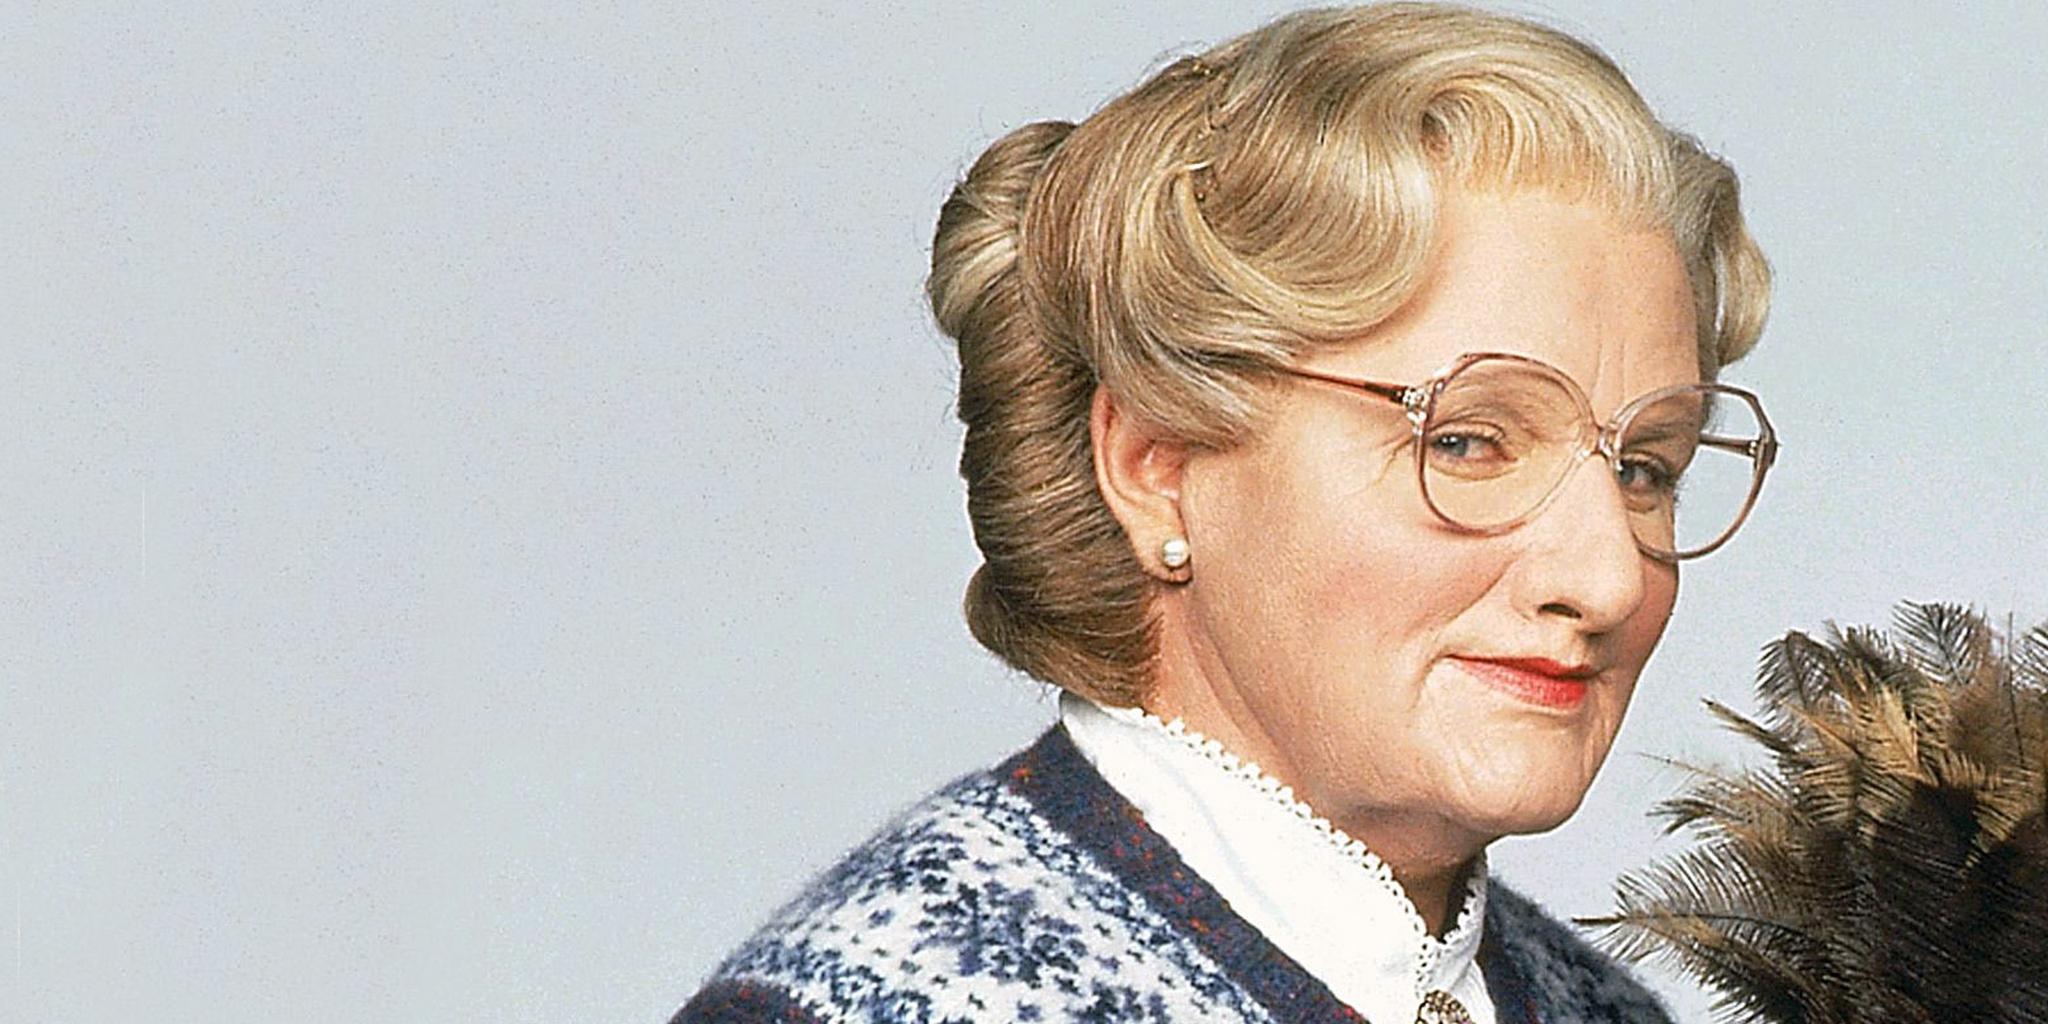 Mrs. Doubtfire Robin Williams, funniest movie characters